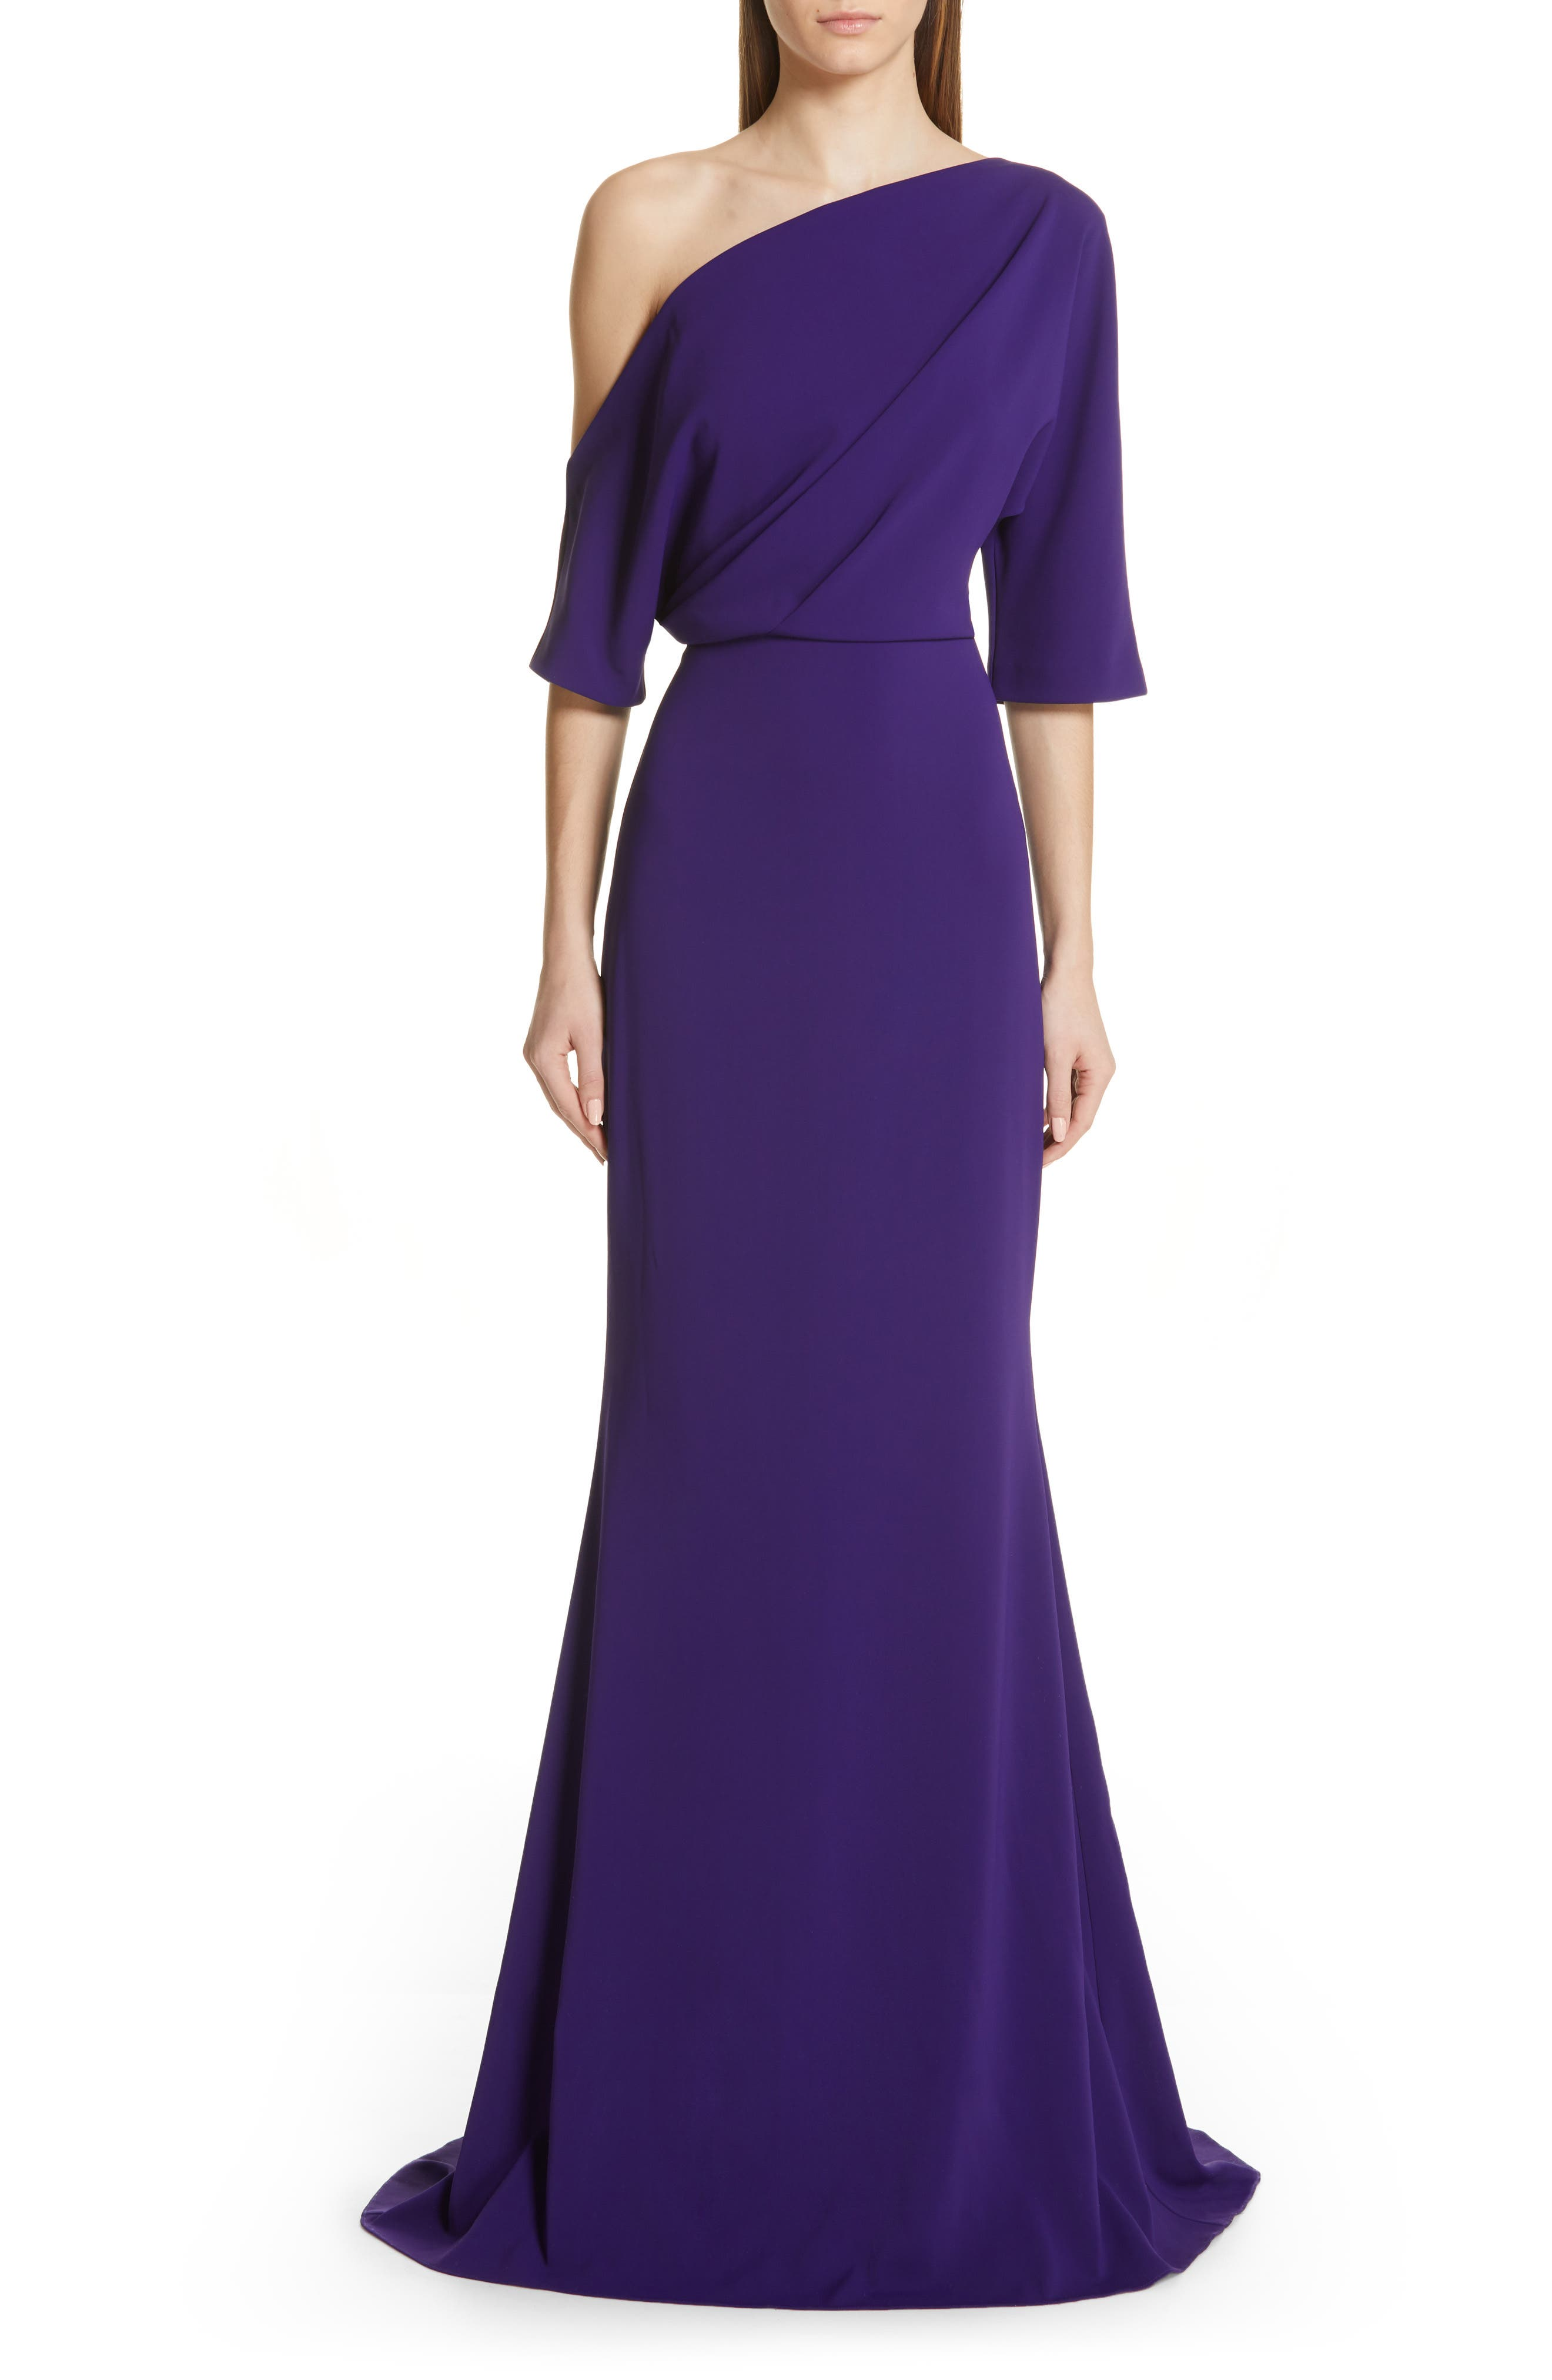 Badgley Mischka One-Shoulder Trumpet Evening Dress, Purple